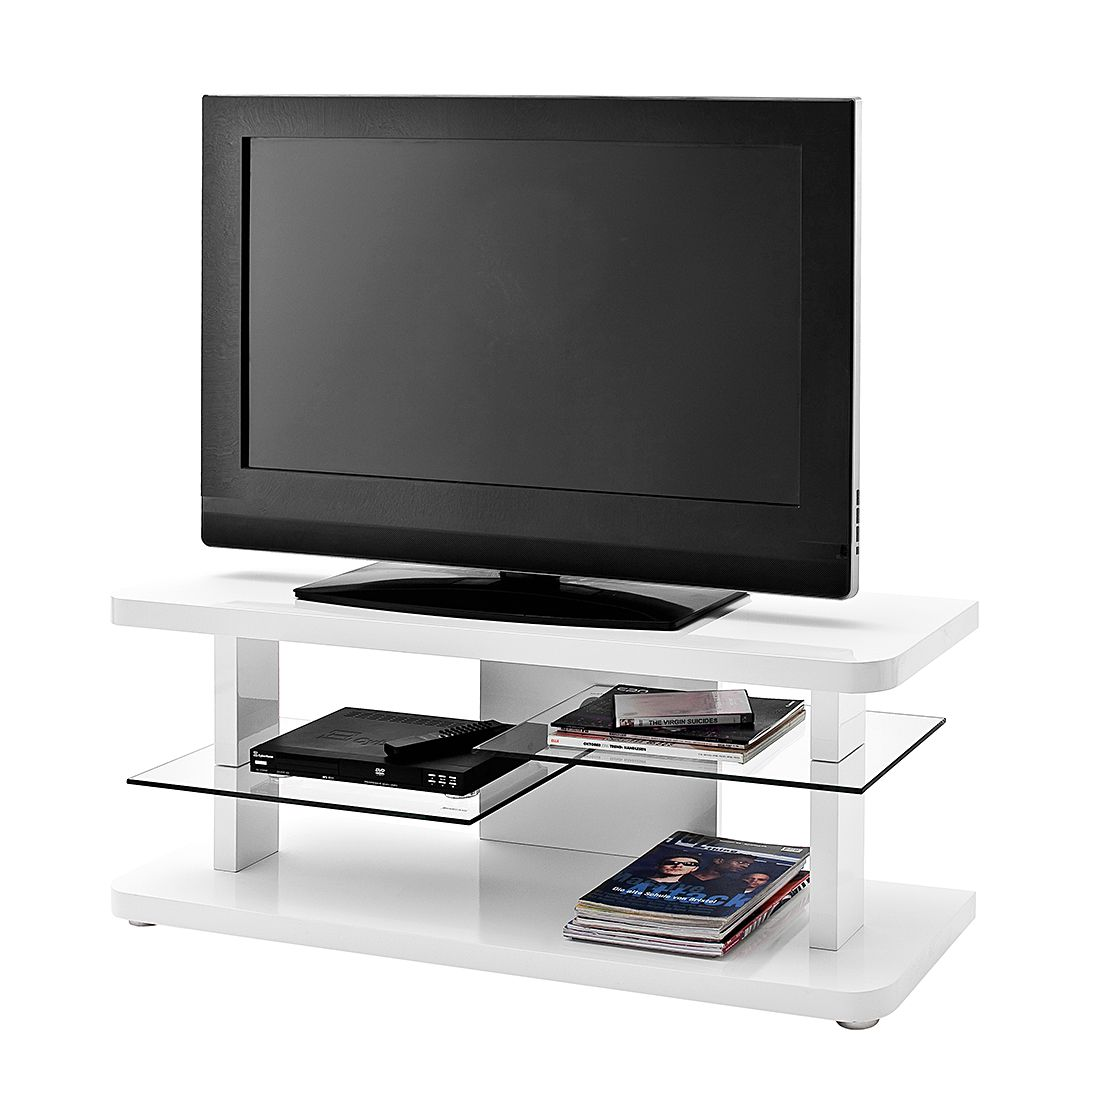 meuble tv profondeur 50 cm maison design. Black Bedroom Furniture Sets. Home Design Ideas